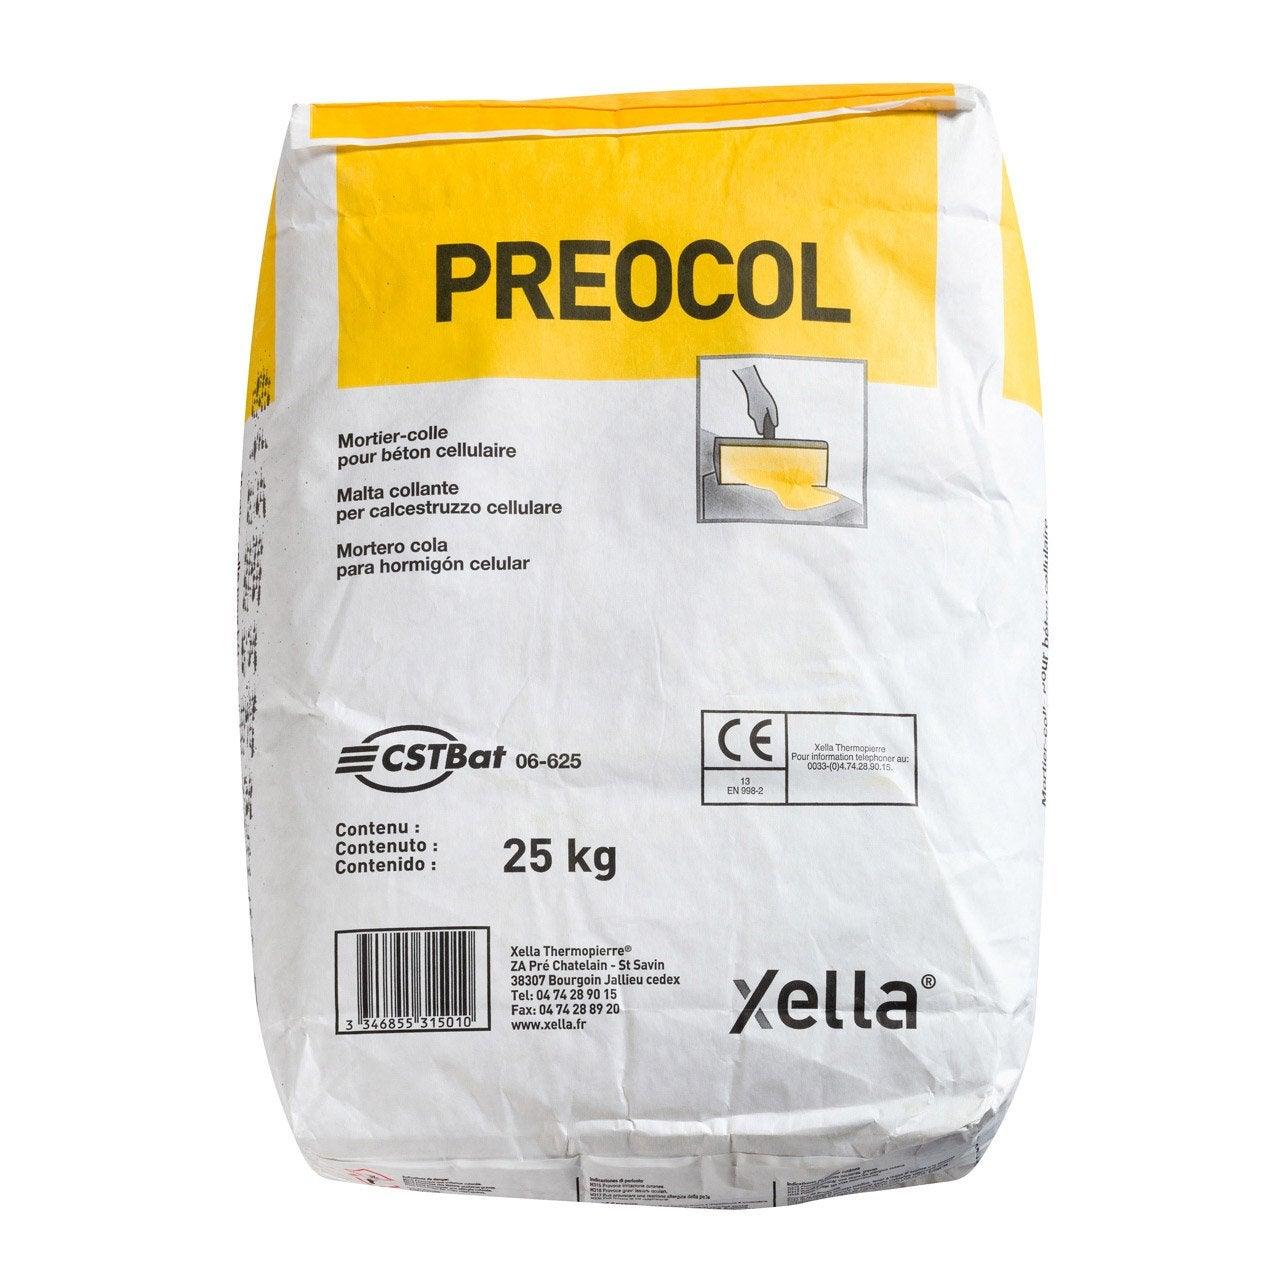 Mortier colle pour b ton cellulaire preocol preocol 25 kg leroy merlin - Colle beton cellulaire leroy merlin ...